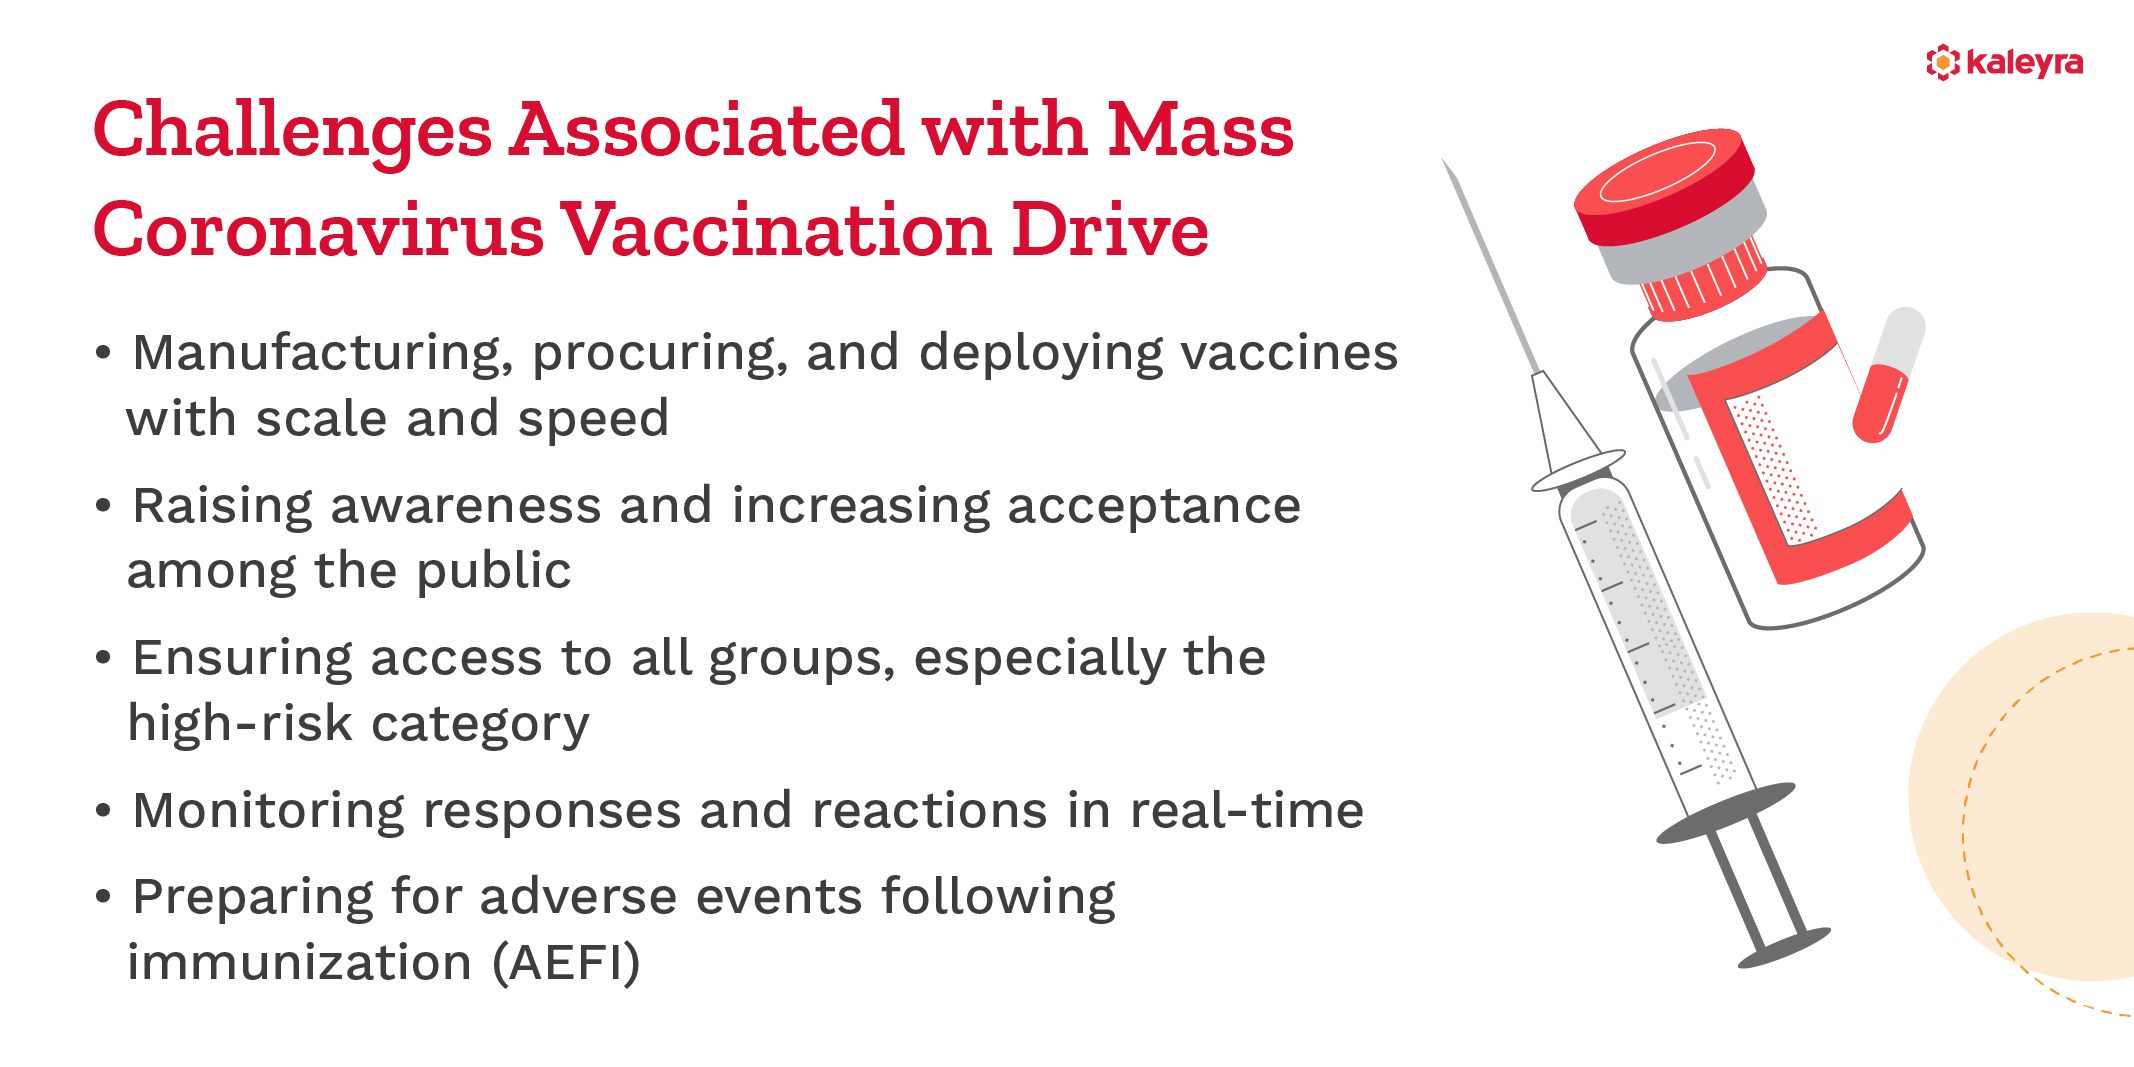 Challenges associated with mass coronavirus vaccination drive